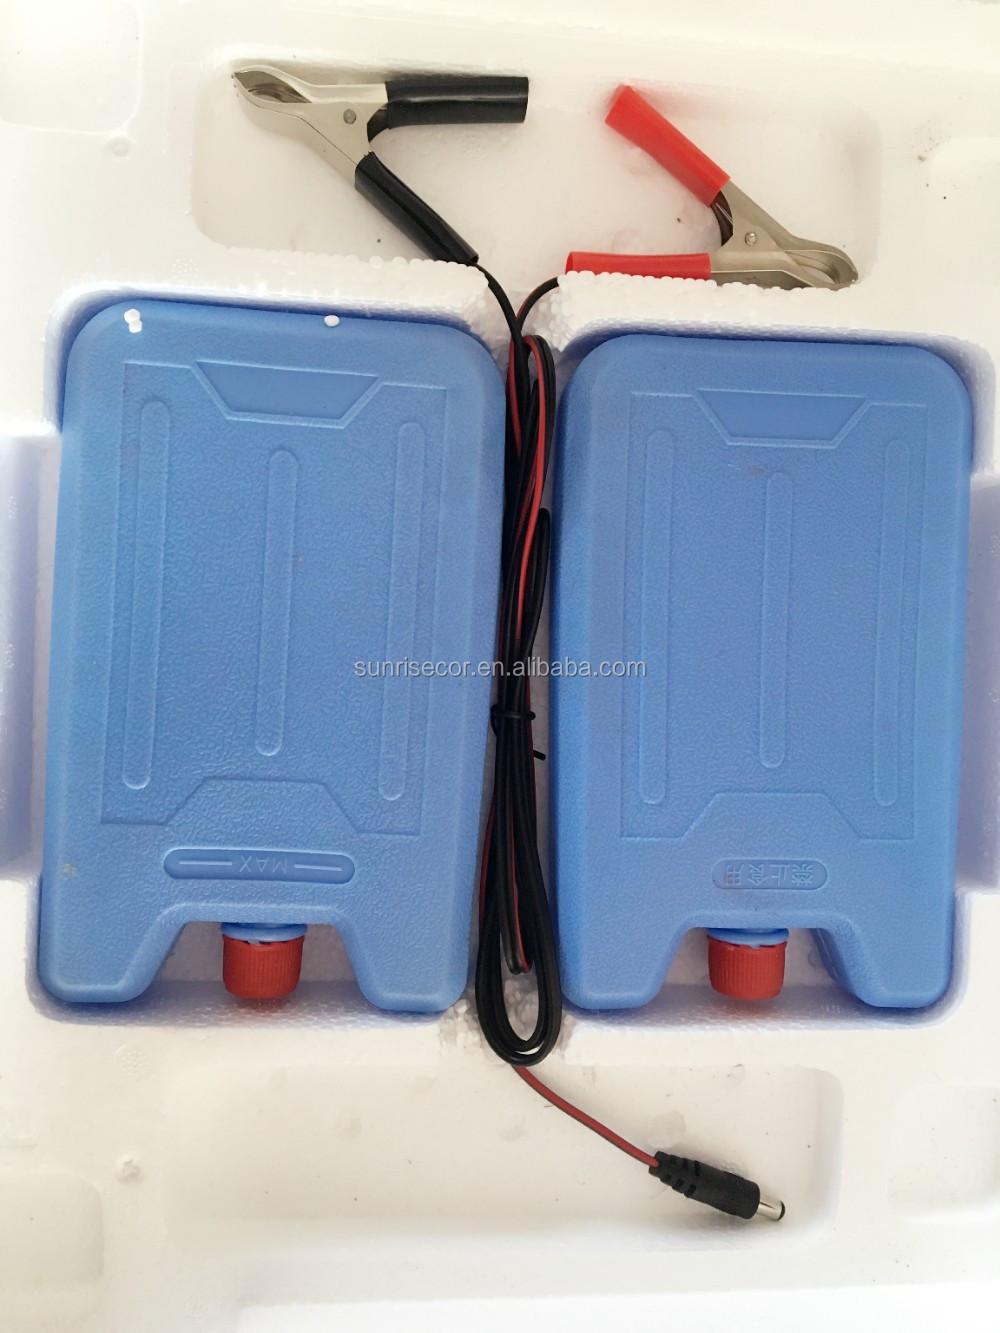 Solar Power Cooler 2017 New Ideas Small Room Use Solar Power Dc12v 6l Water Tank Air